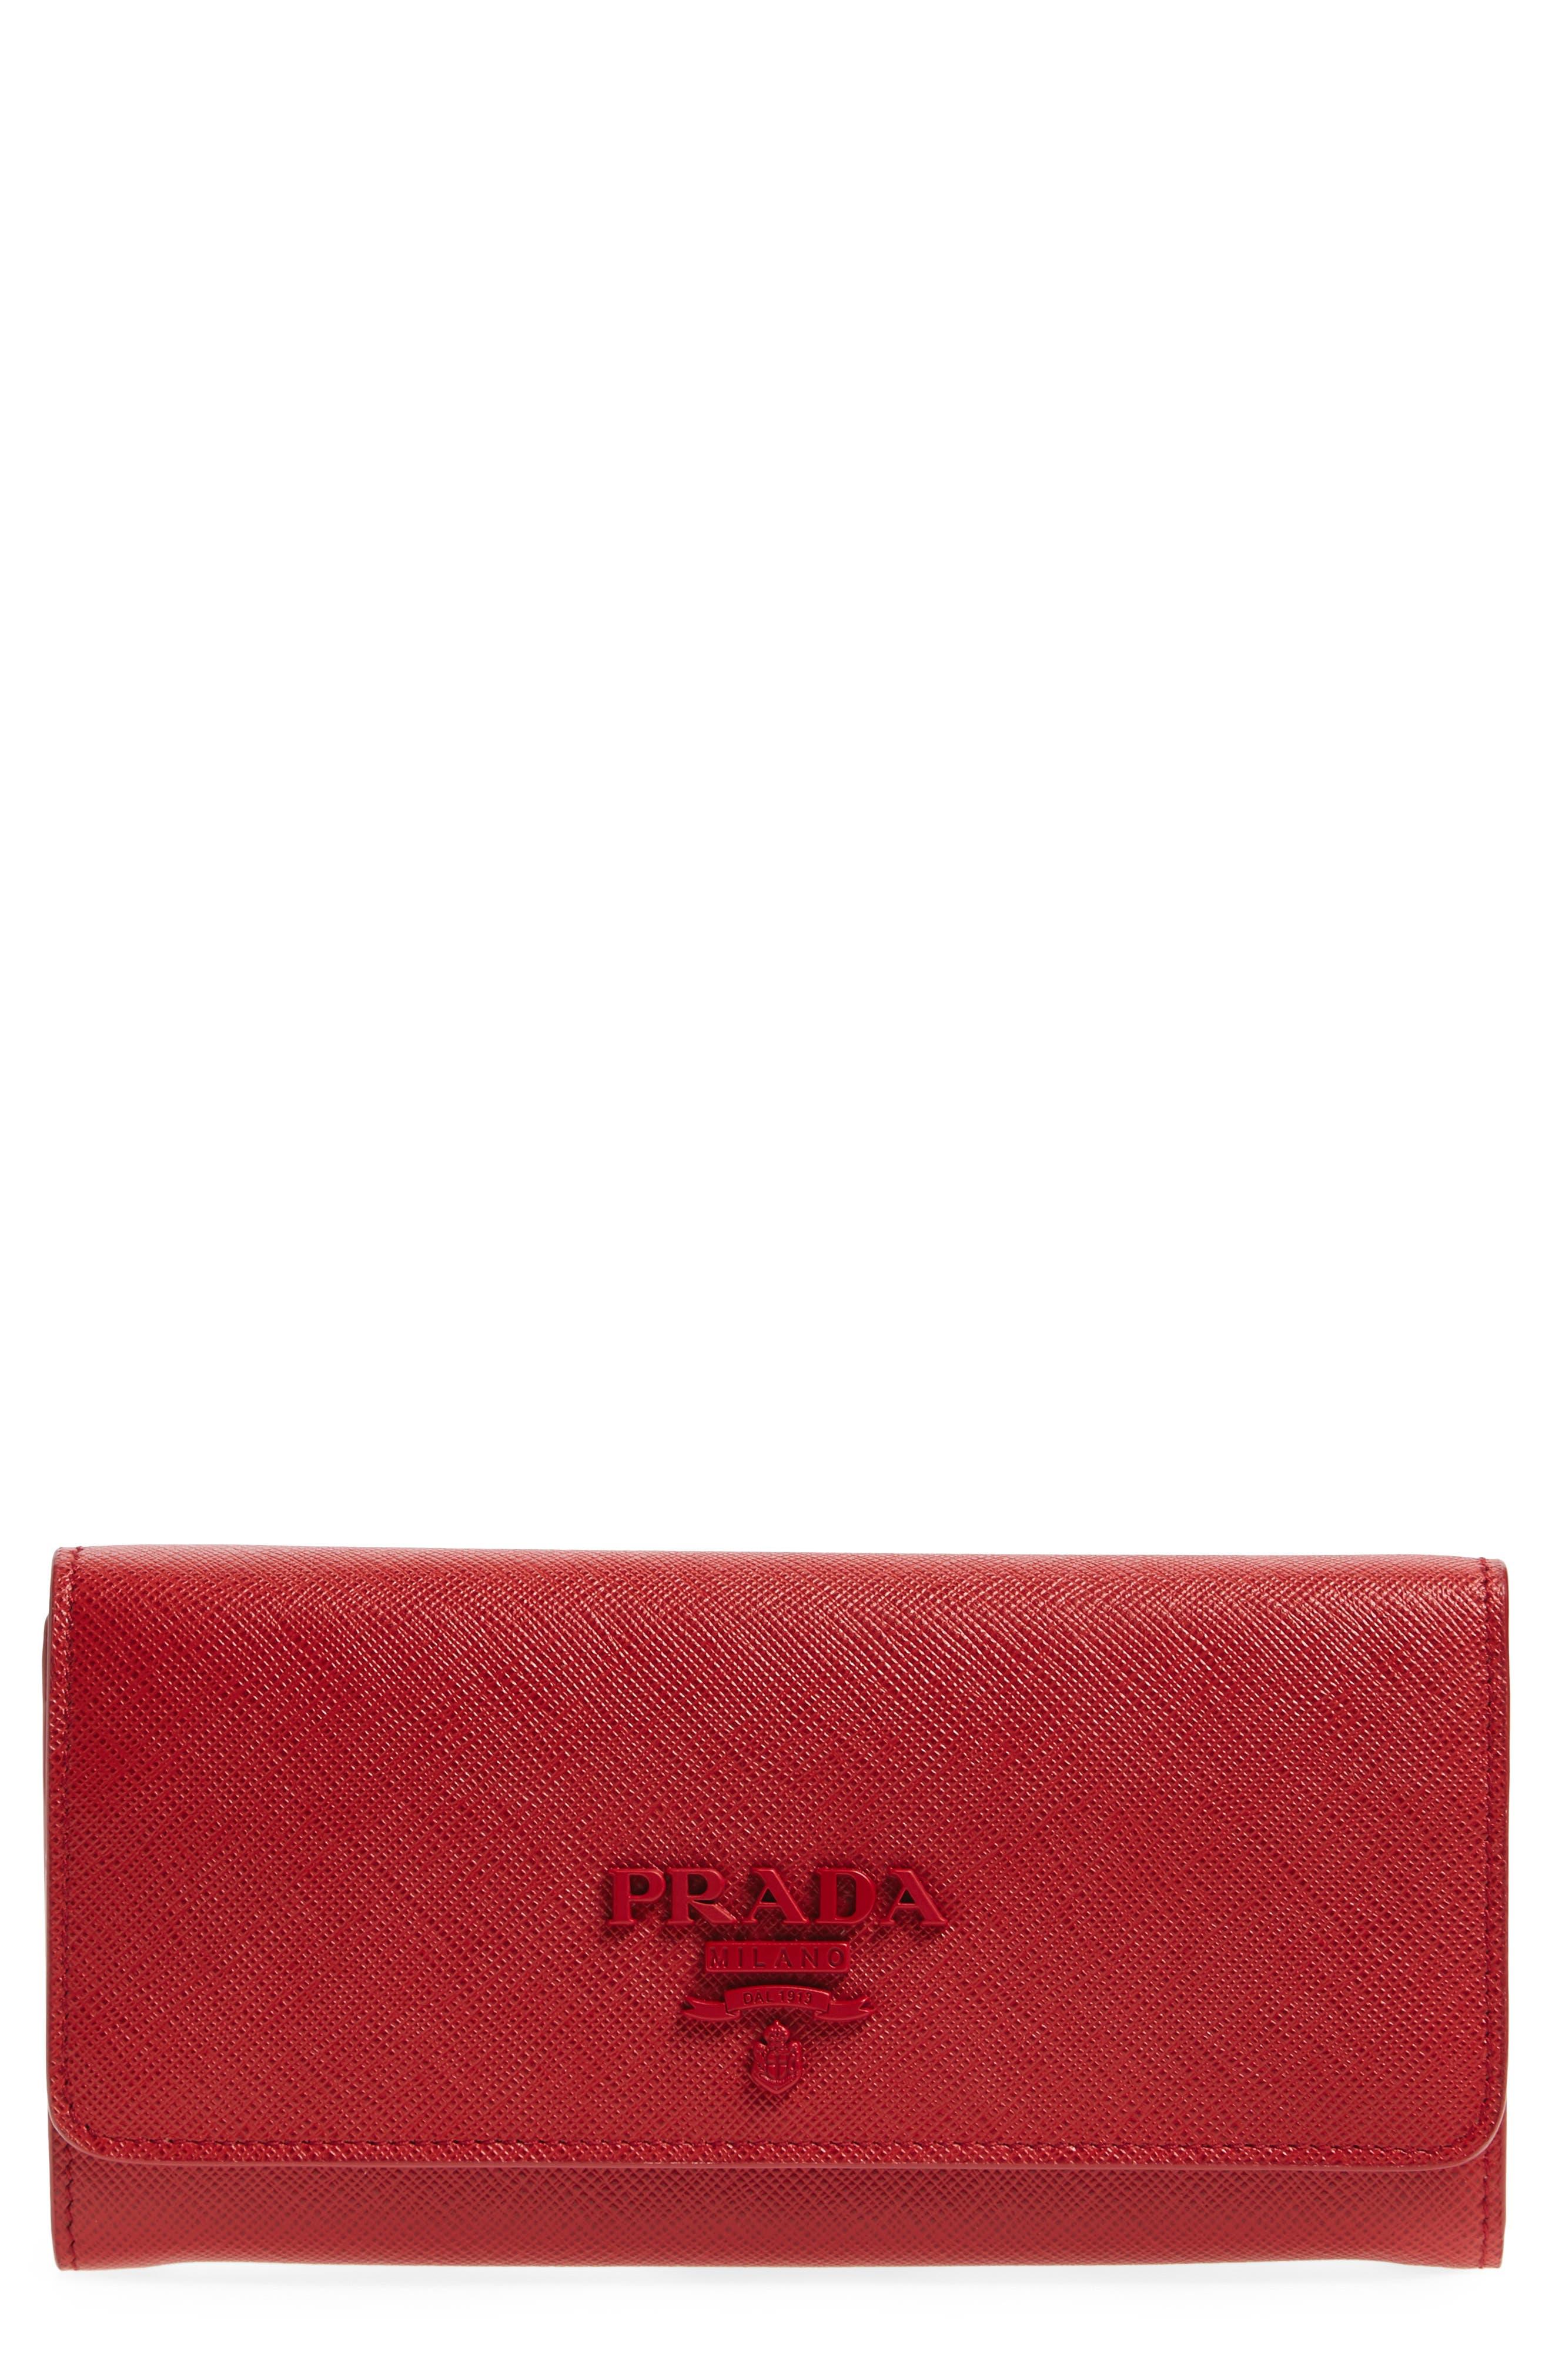 688485a77a00 Women's Prada Designer Wallets & Accessories | Nordstrom